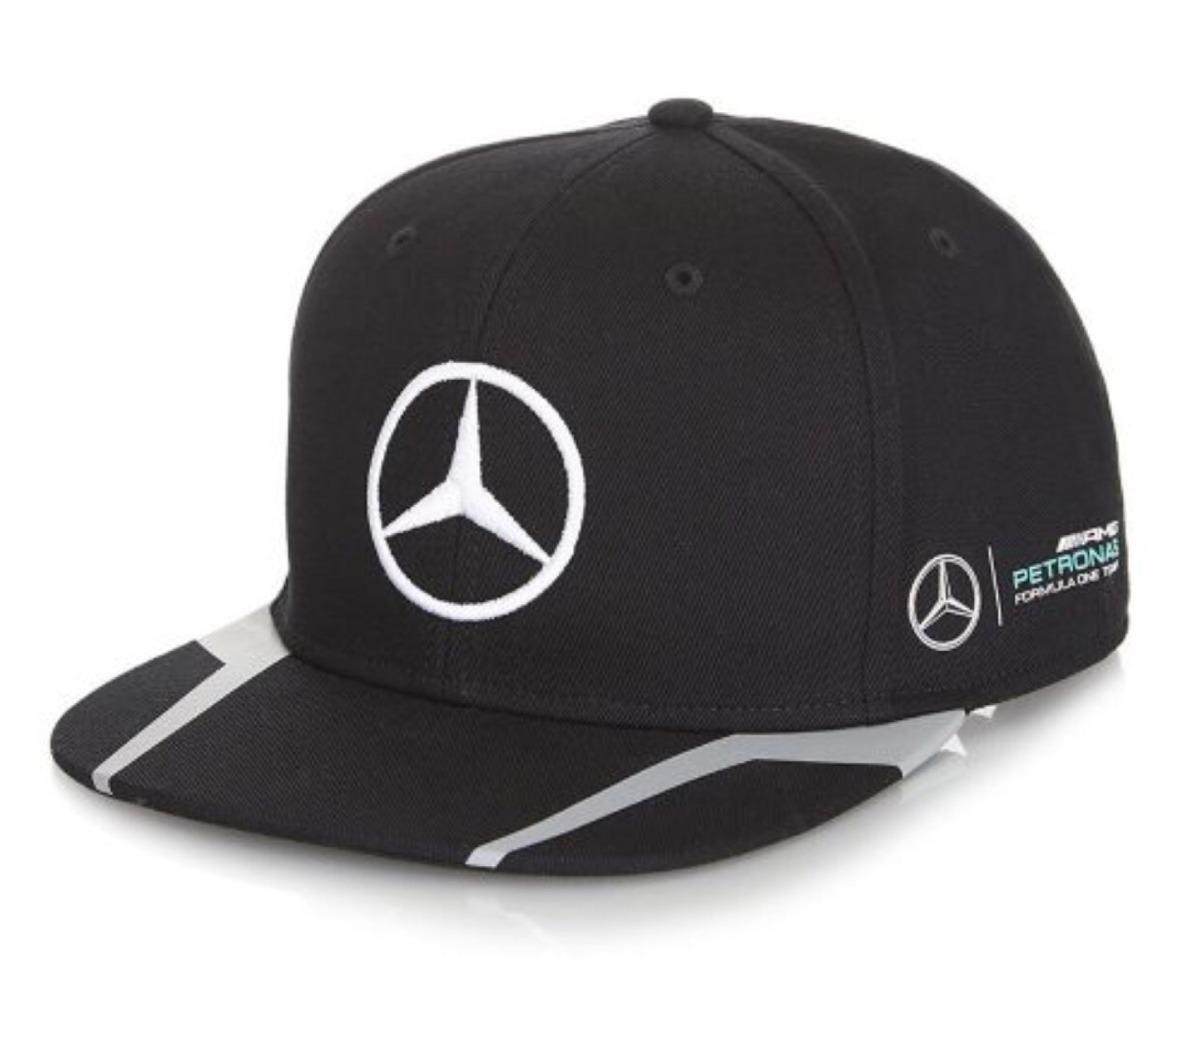 429901173b2b5 Gorra Flat Mercedes Petronas De Lewis Hamilton Temporada 201 ...